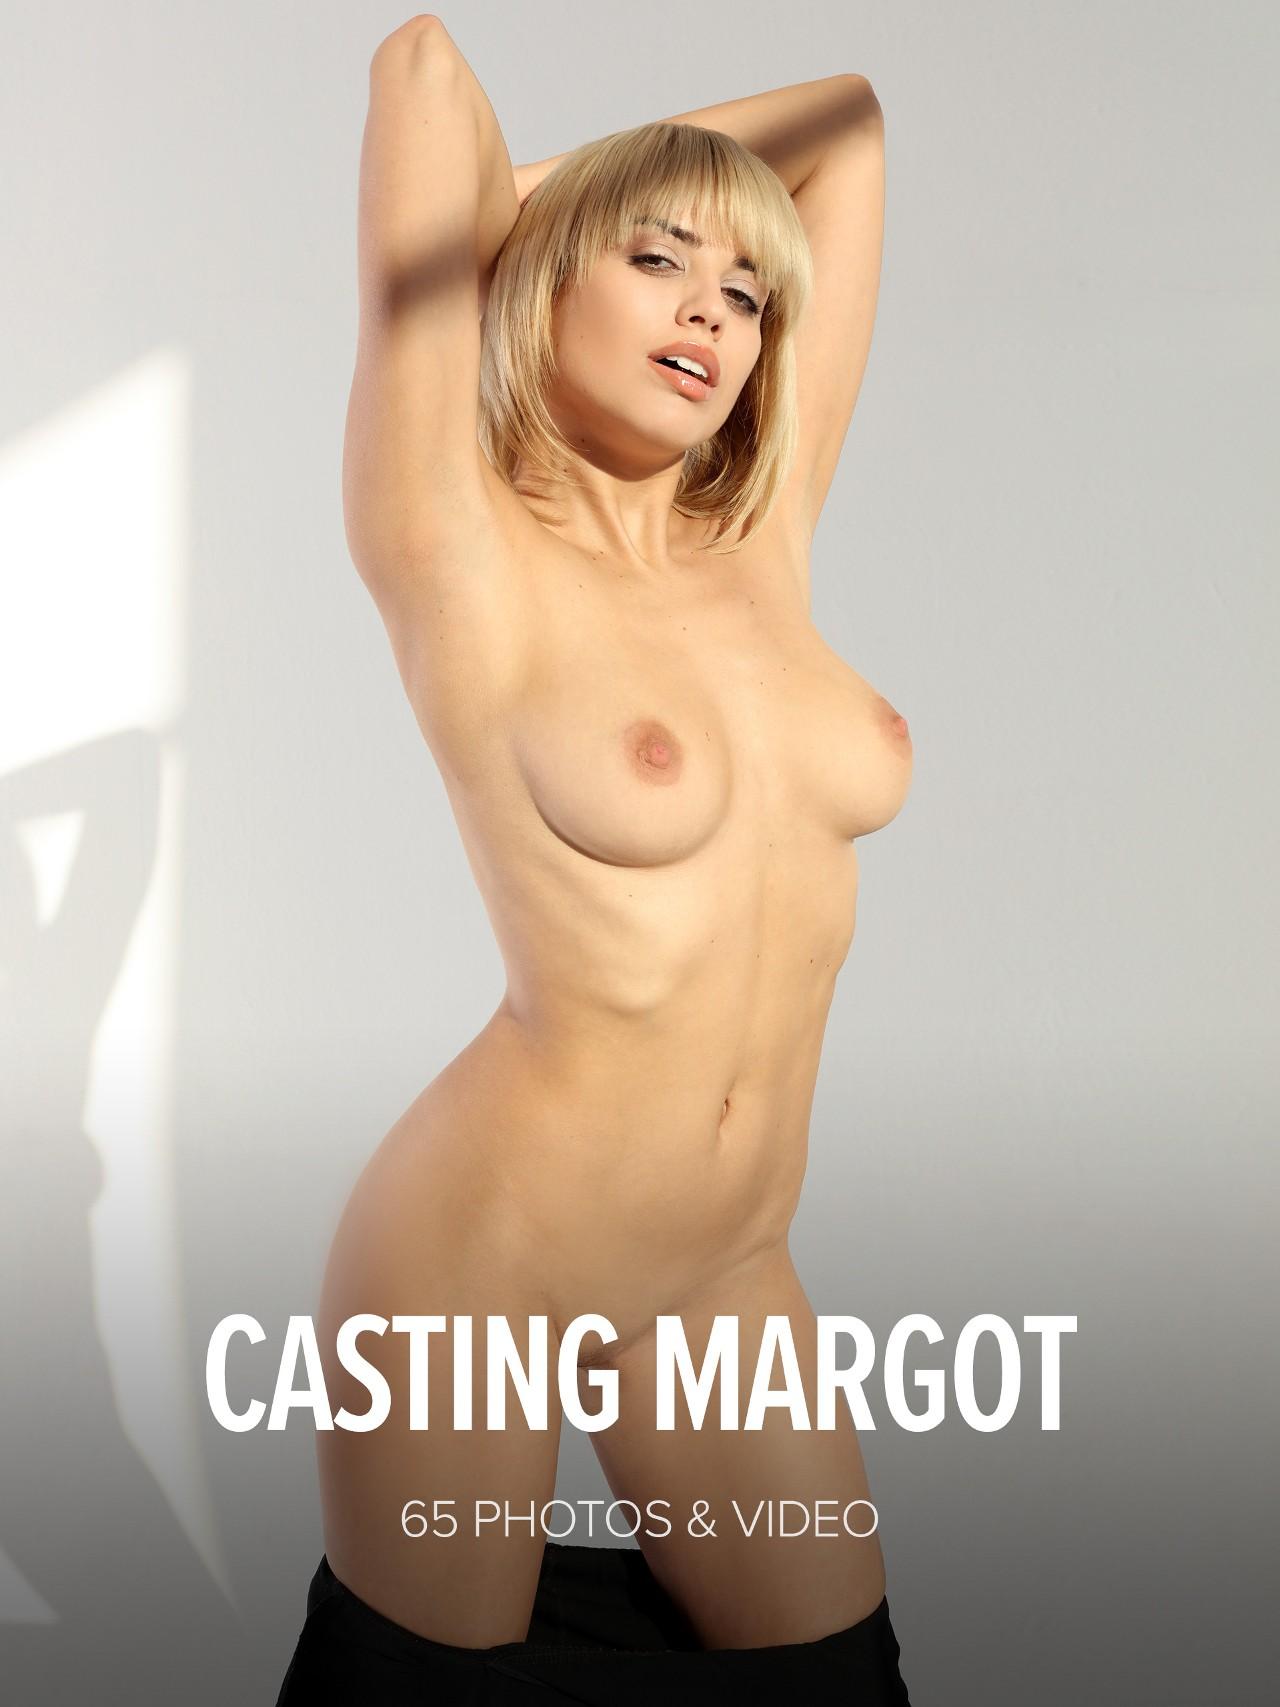 Margot: CASTING Margot